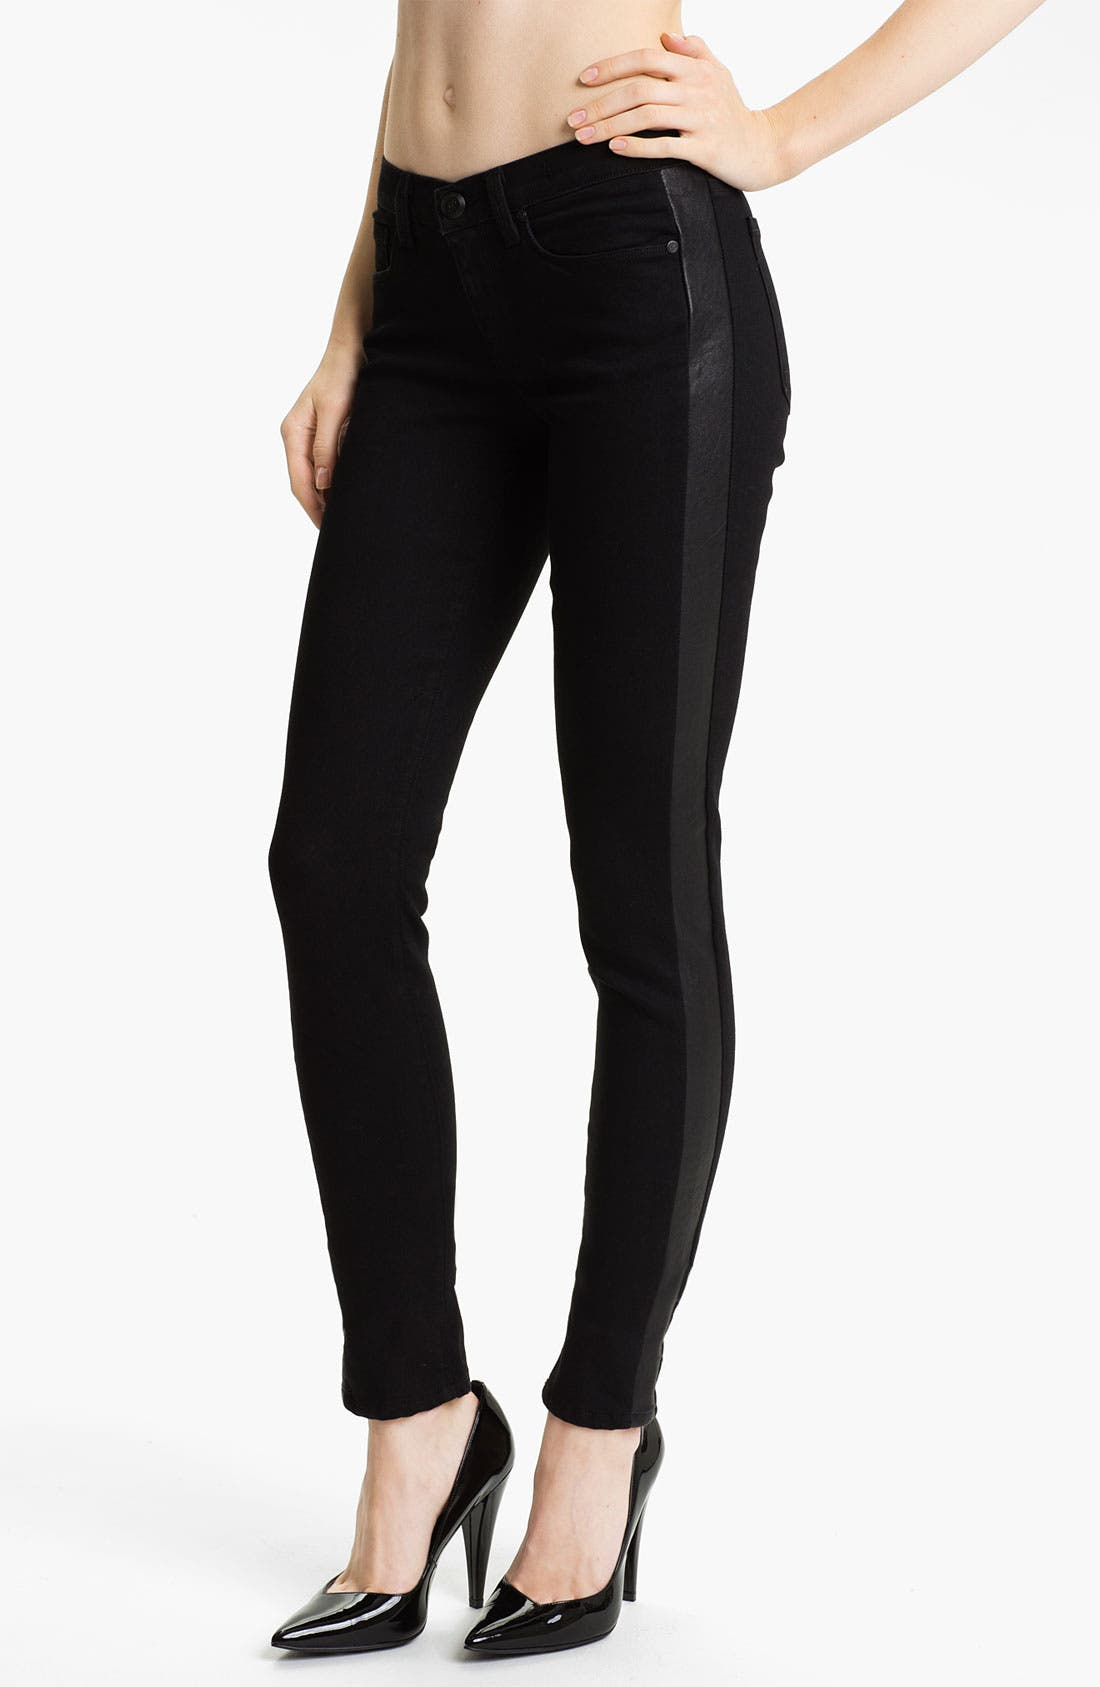 Main Image - Juicy Couture Leather Tux Stripe Skinny Jeans (Lilia)